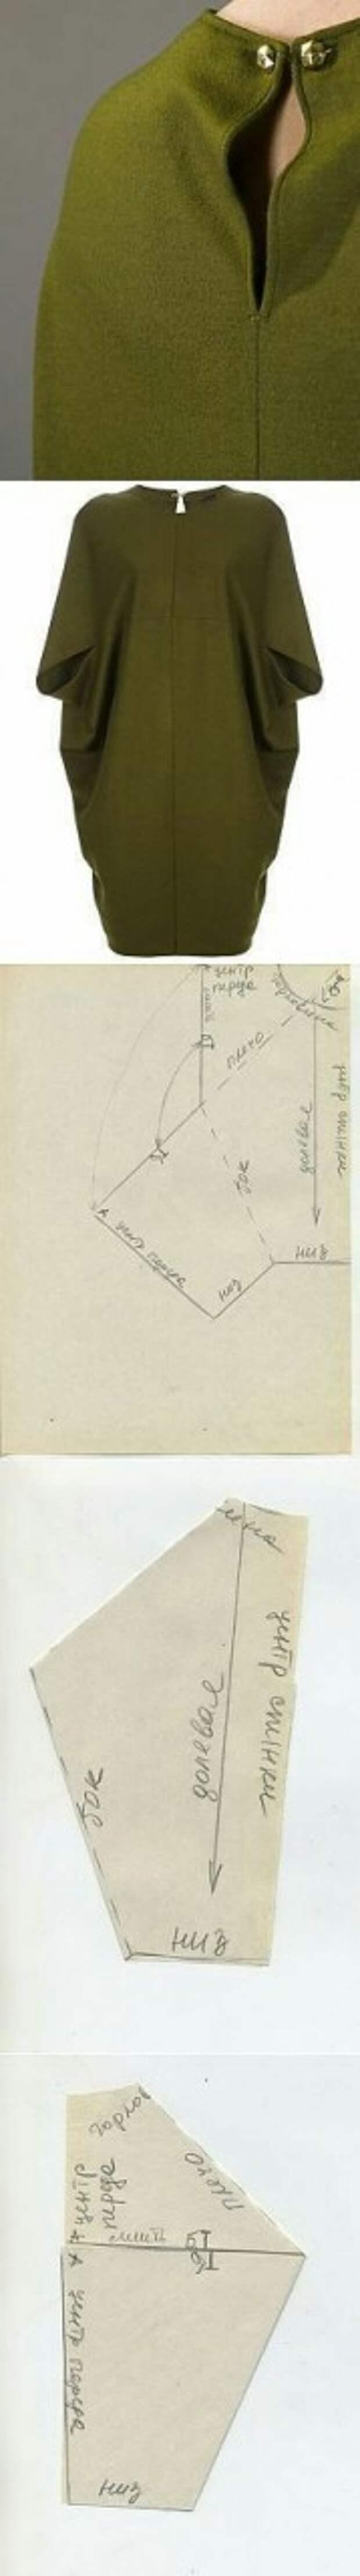 Выкройки на основе конверта (подборка)